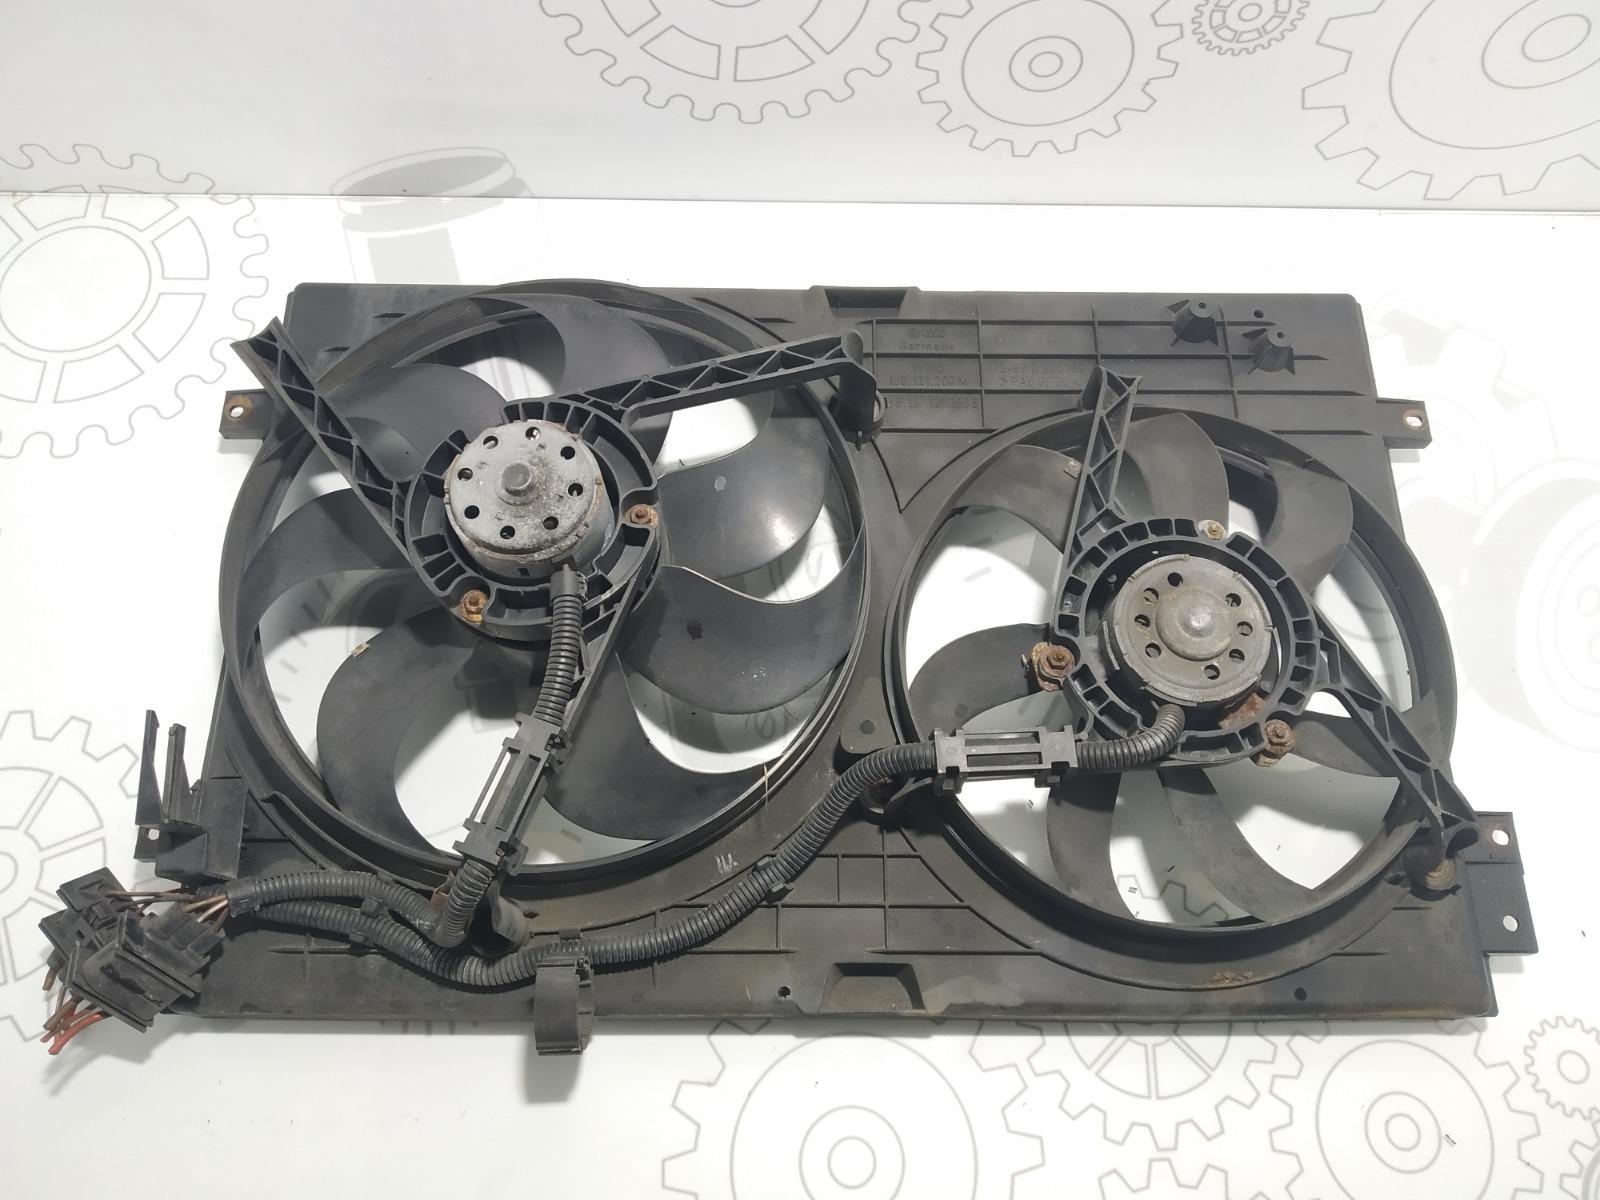 Вентилятор радиатора Skoda Octavia 1.9 TDI 2002 (б/у)